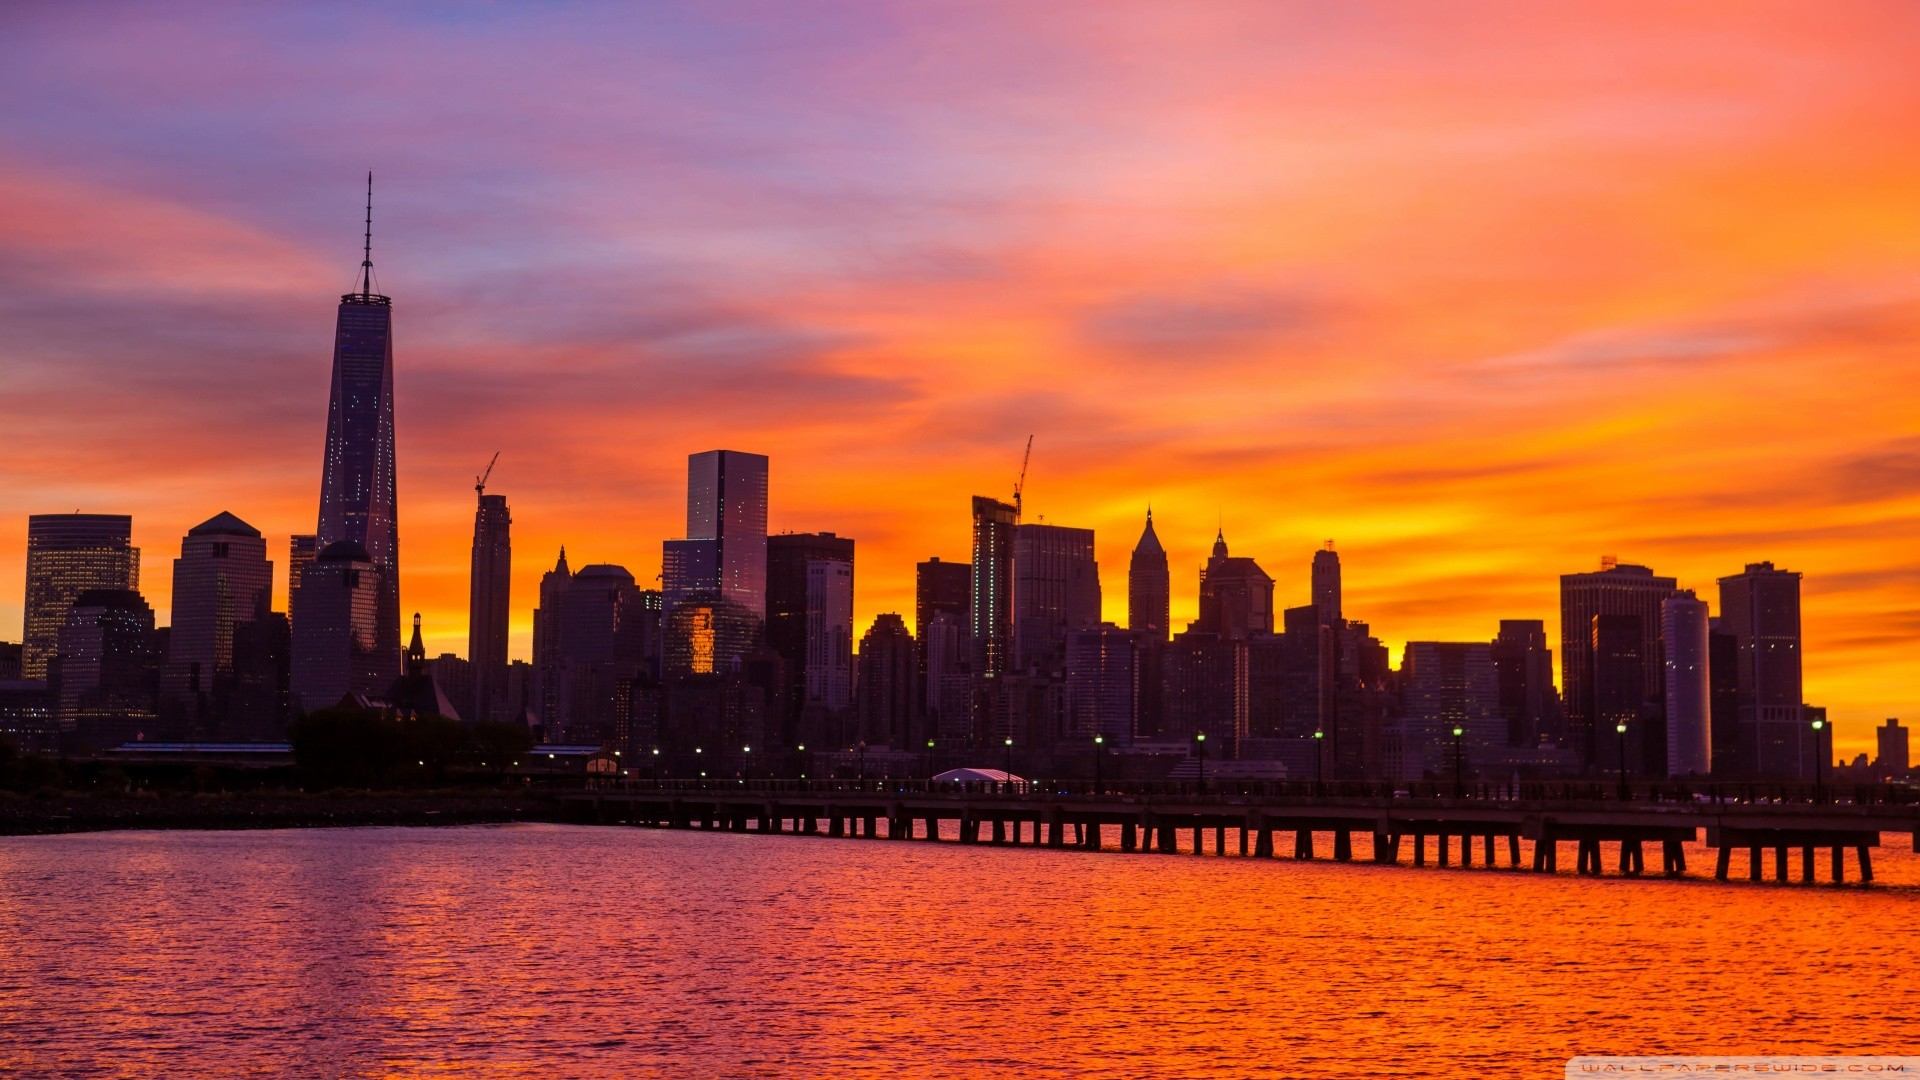 … new york city skyline sunrise hd desktop wallpaper widescreen …